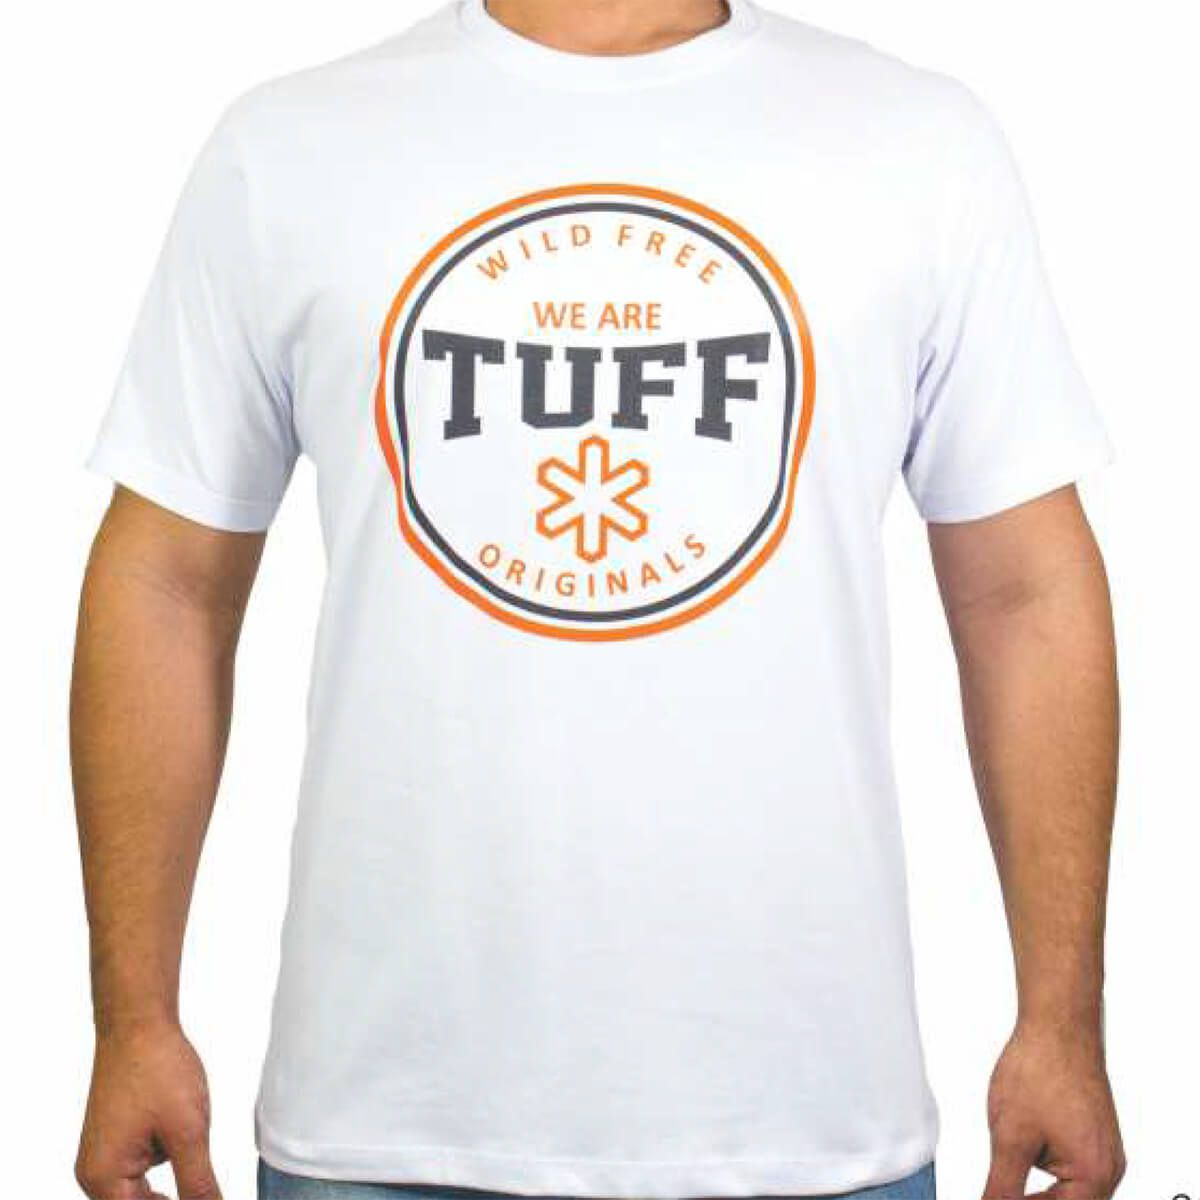 4afb4fe297ec1 Camiseta Tuff Masculina Branca Logo Laranja - Arena Country Echaporã